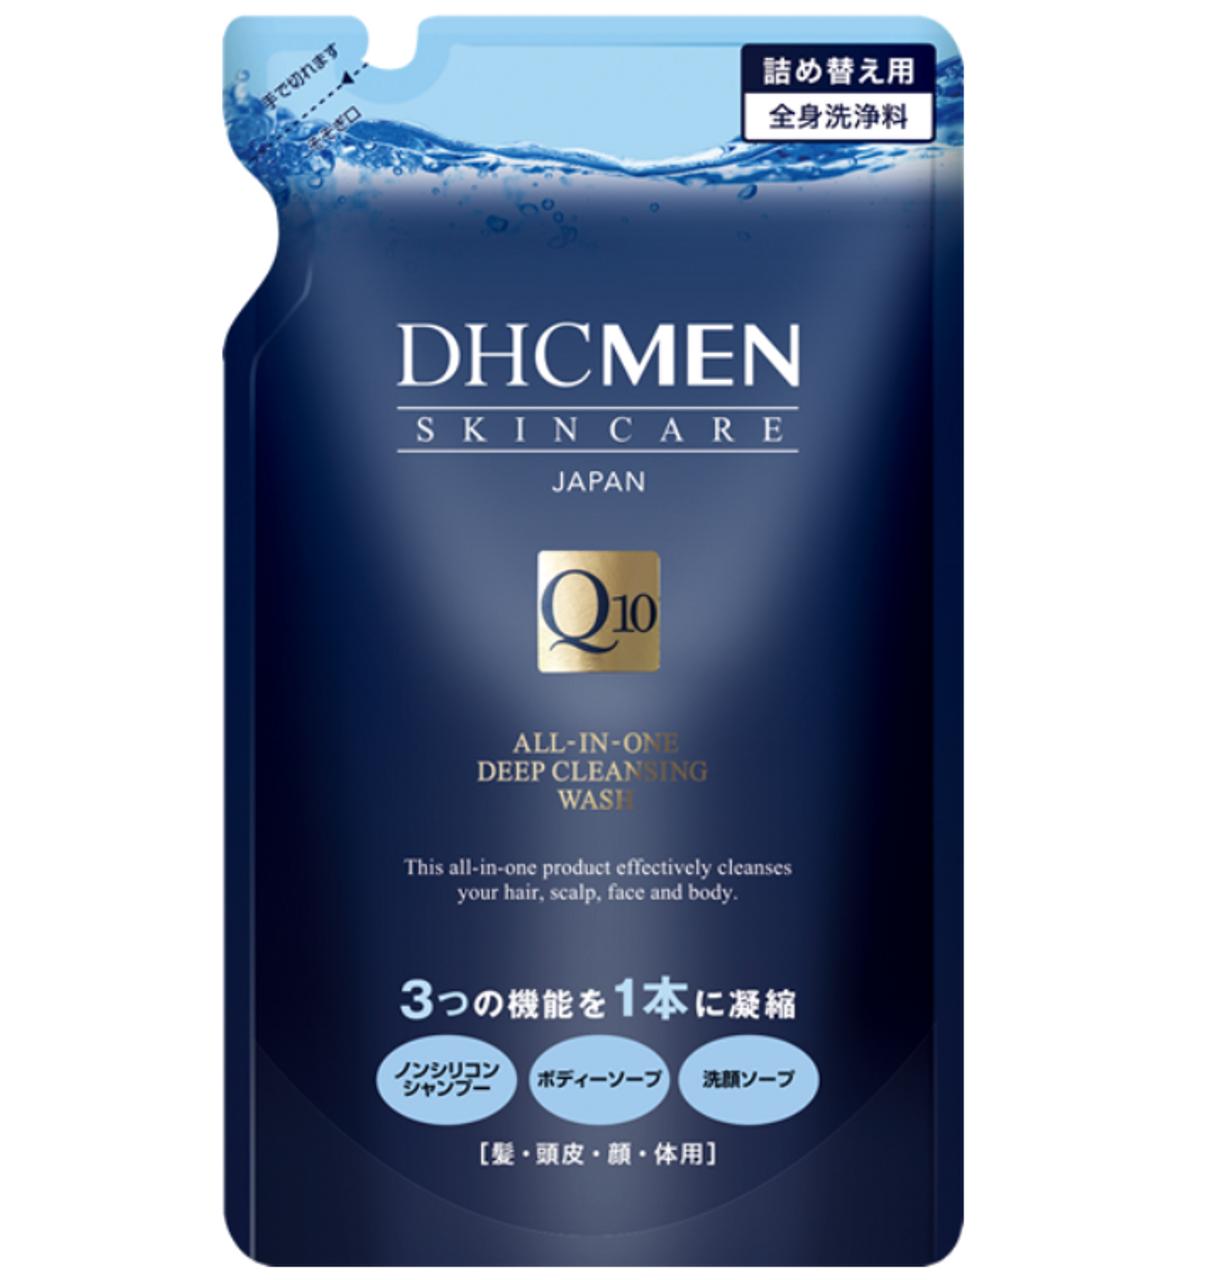 DHC Men All-in-one Deep Cleansing Wash – сменный блок, средство для тела, лица и волос